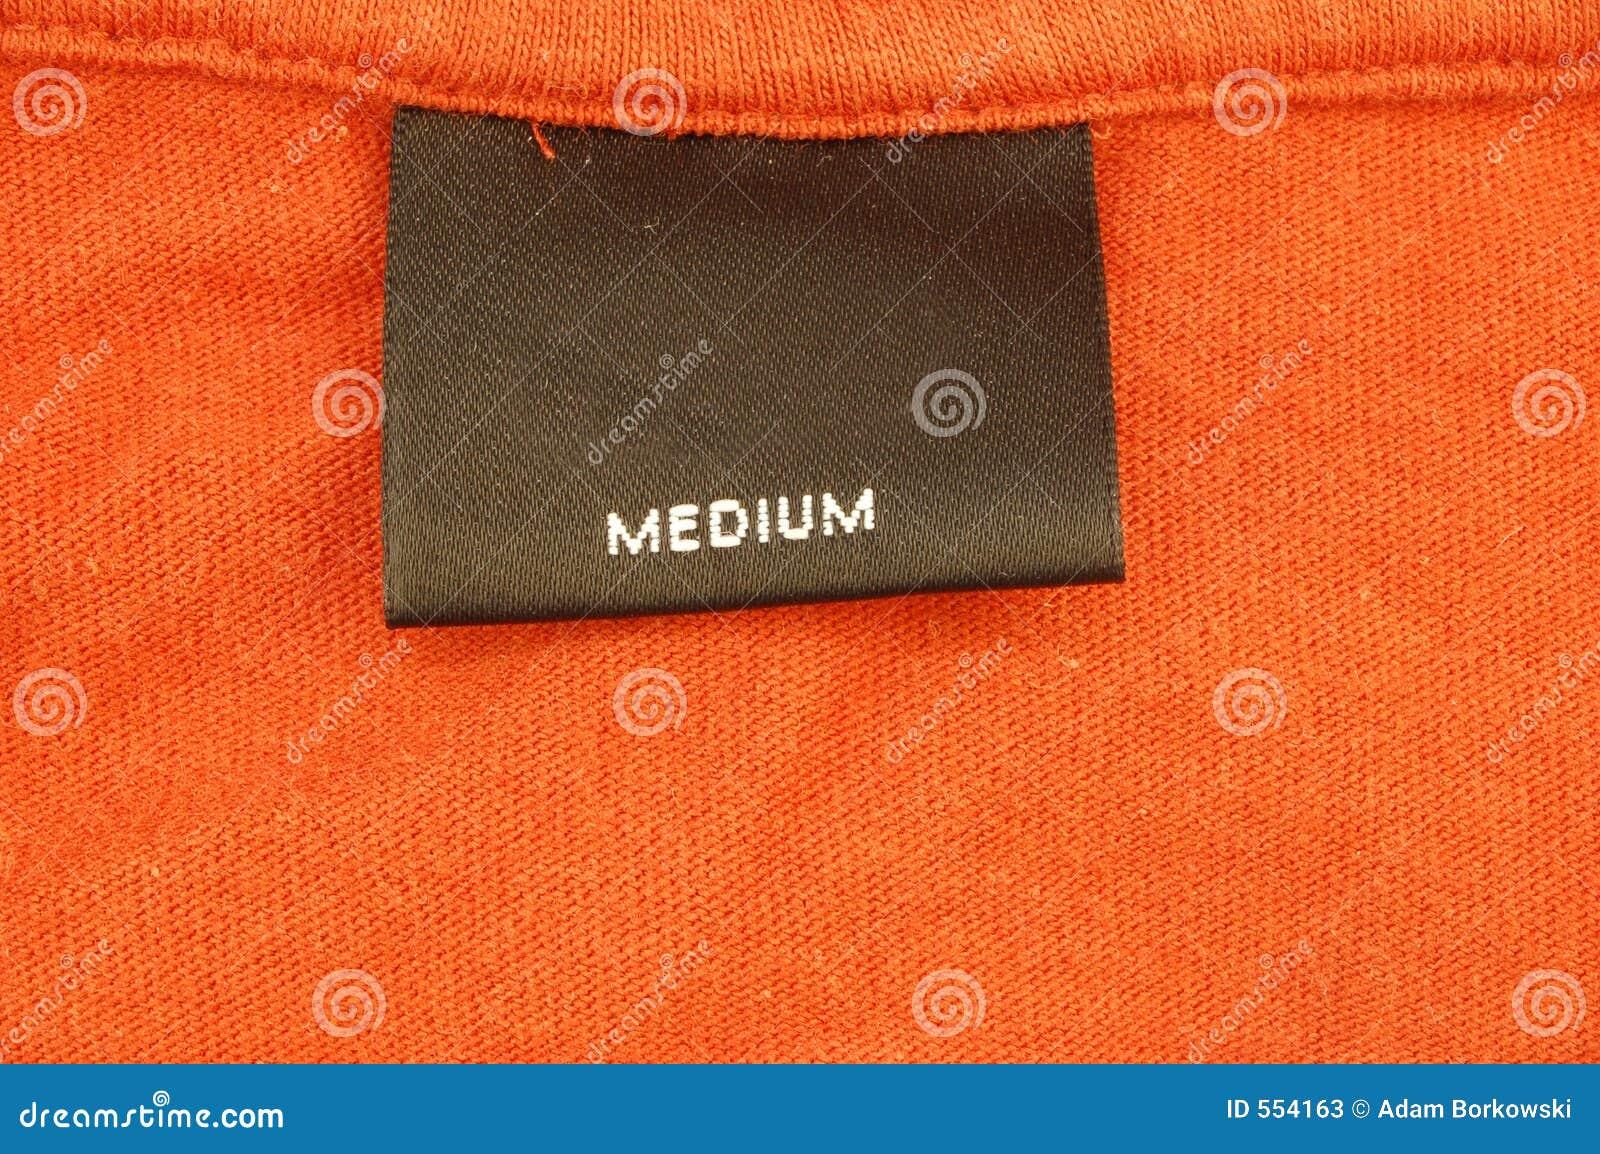 Media (L) camisa 2 do tamanho